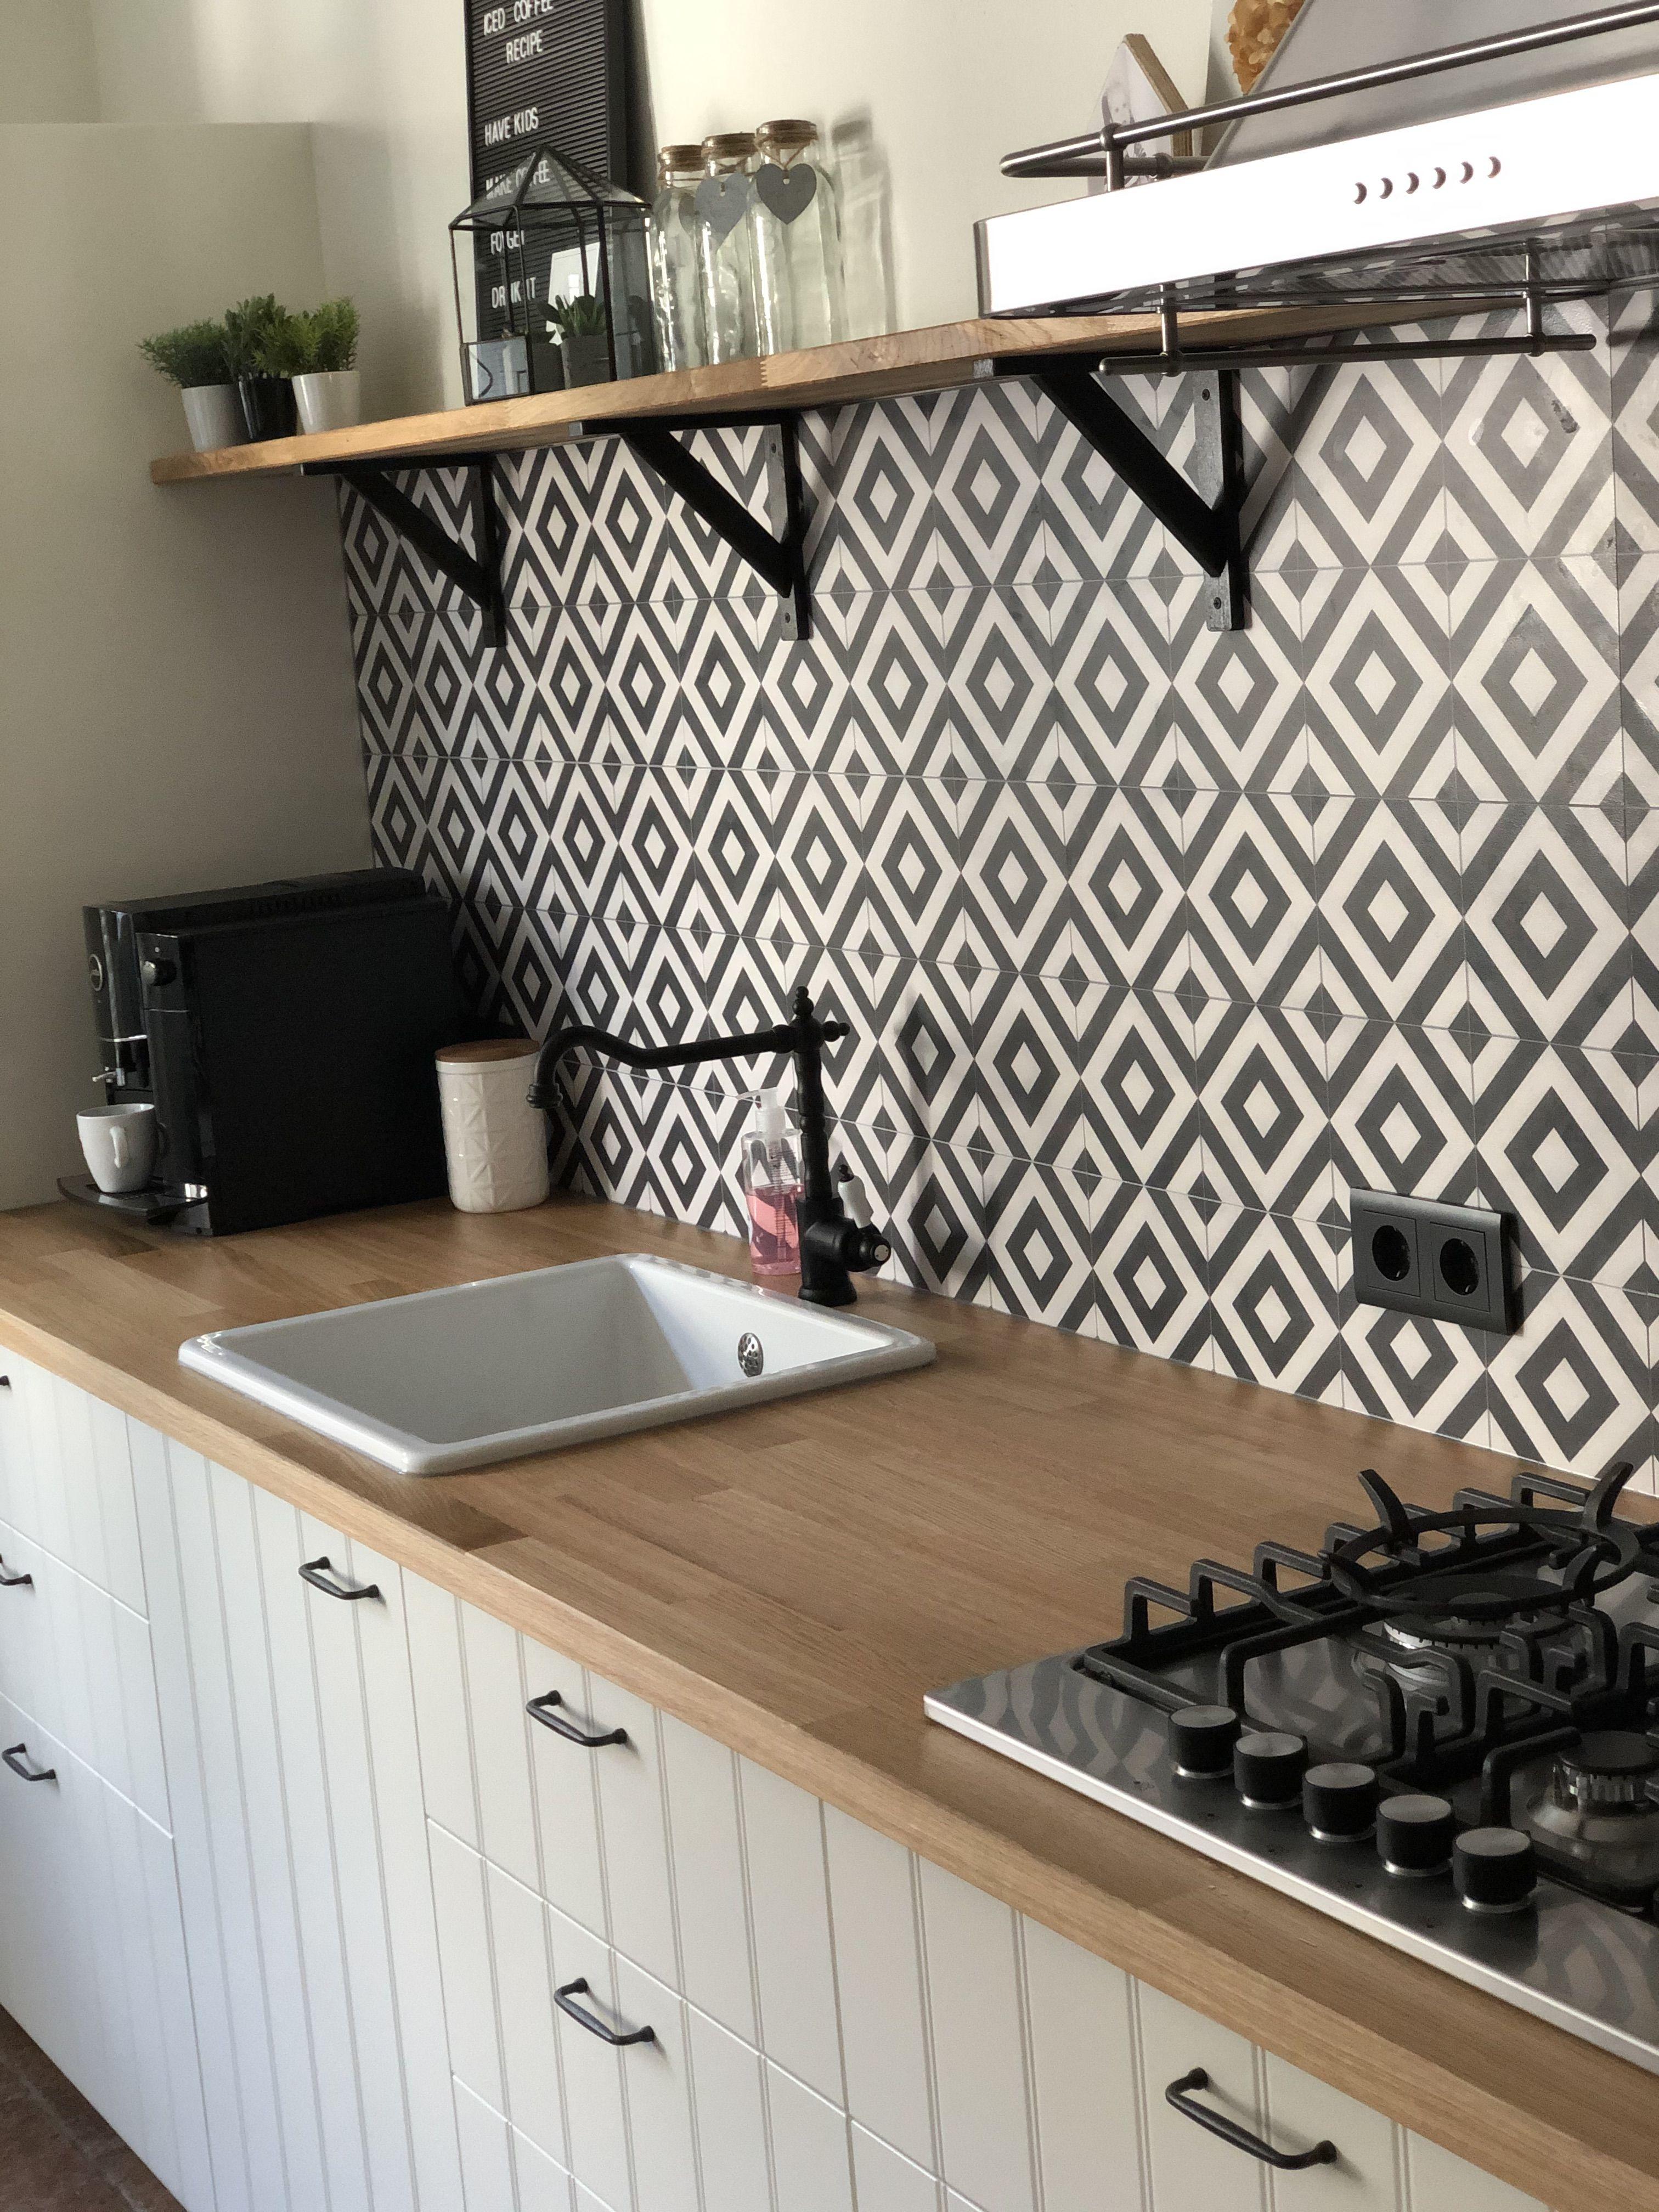 Borite Se Upokojen Izkopati Wandtegels Keuken Ikea M Style Aroma Com